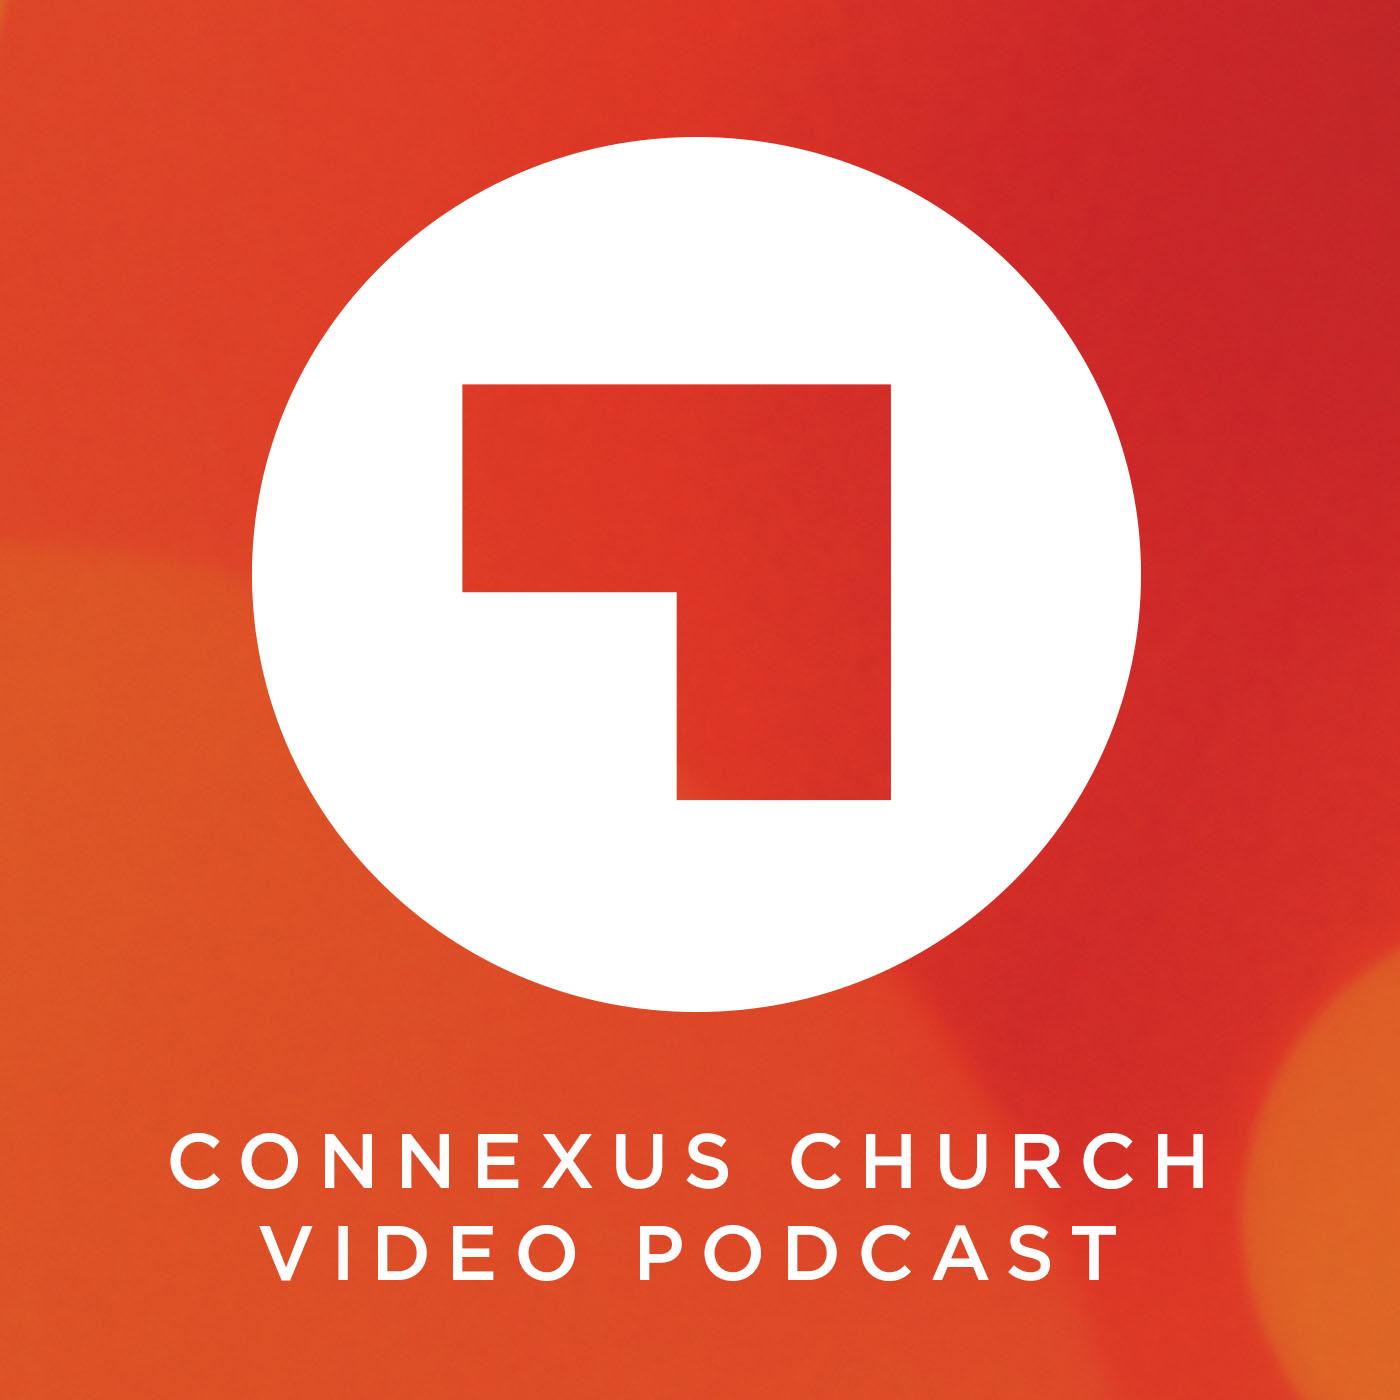 Connexus Church Video Podcast show art